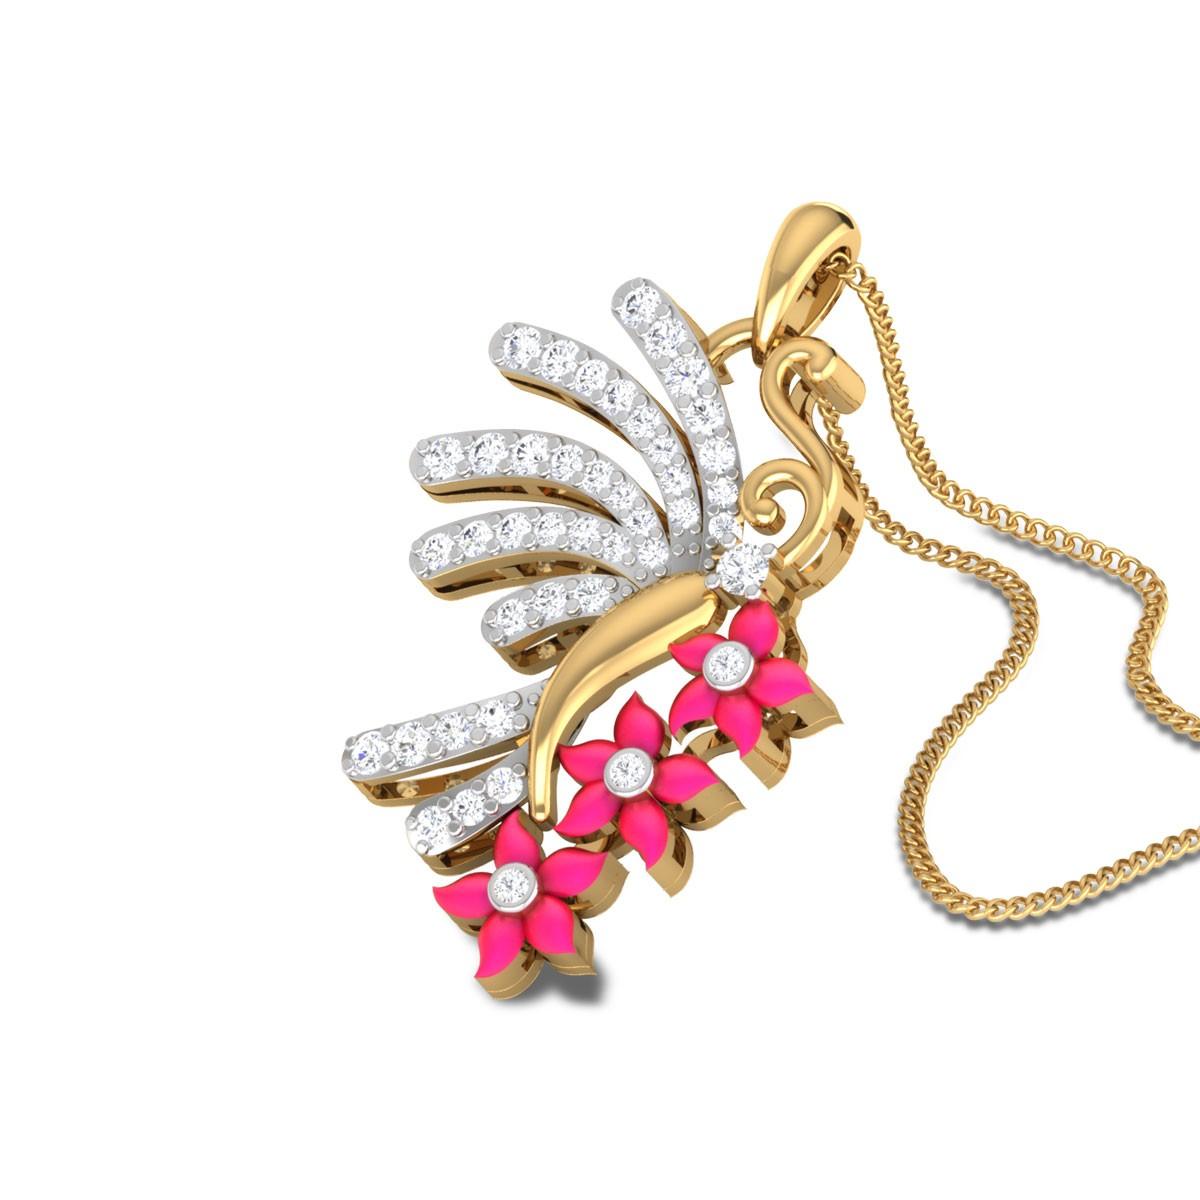 Jinsy Floral Butterfly Diamond Pendant